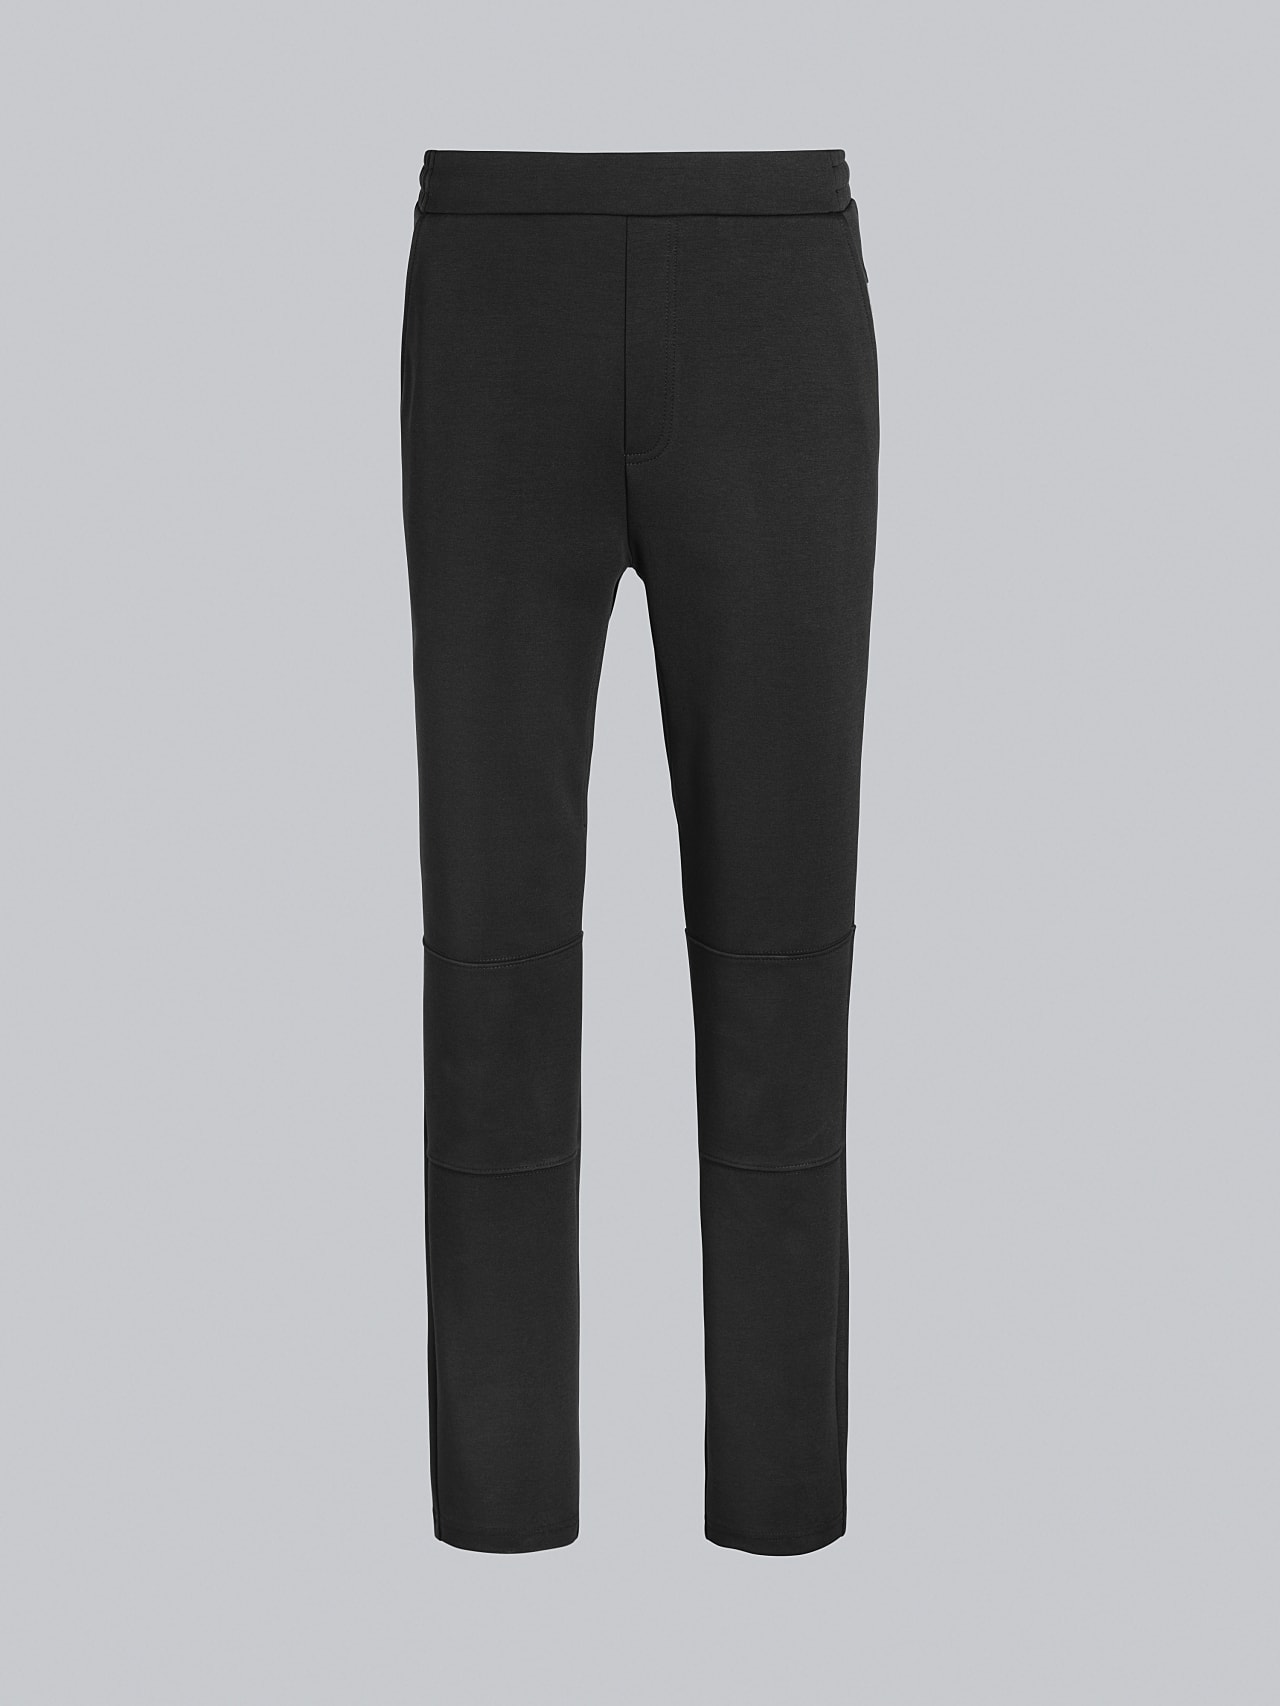 PRYK V7.Y5.02 Premium Sweatpants black Back Alpha Tauri